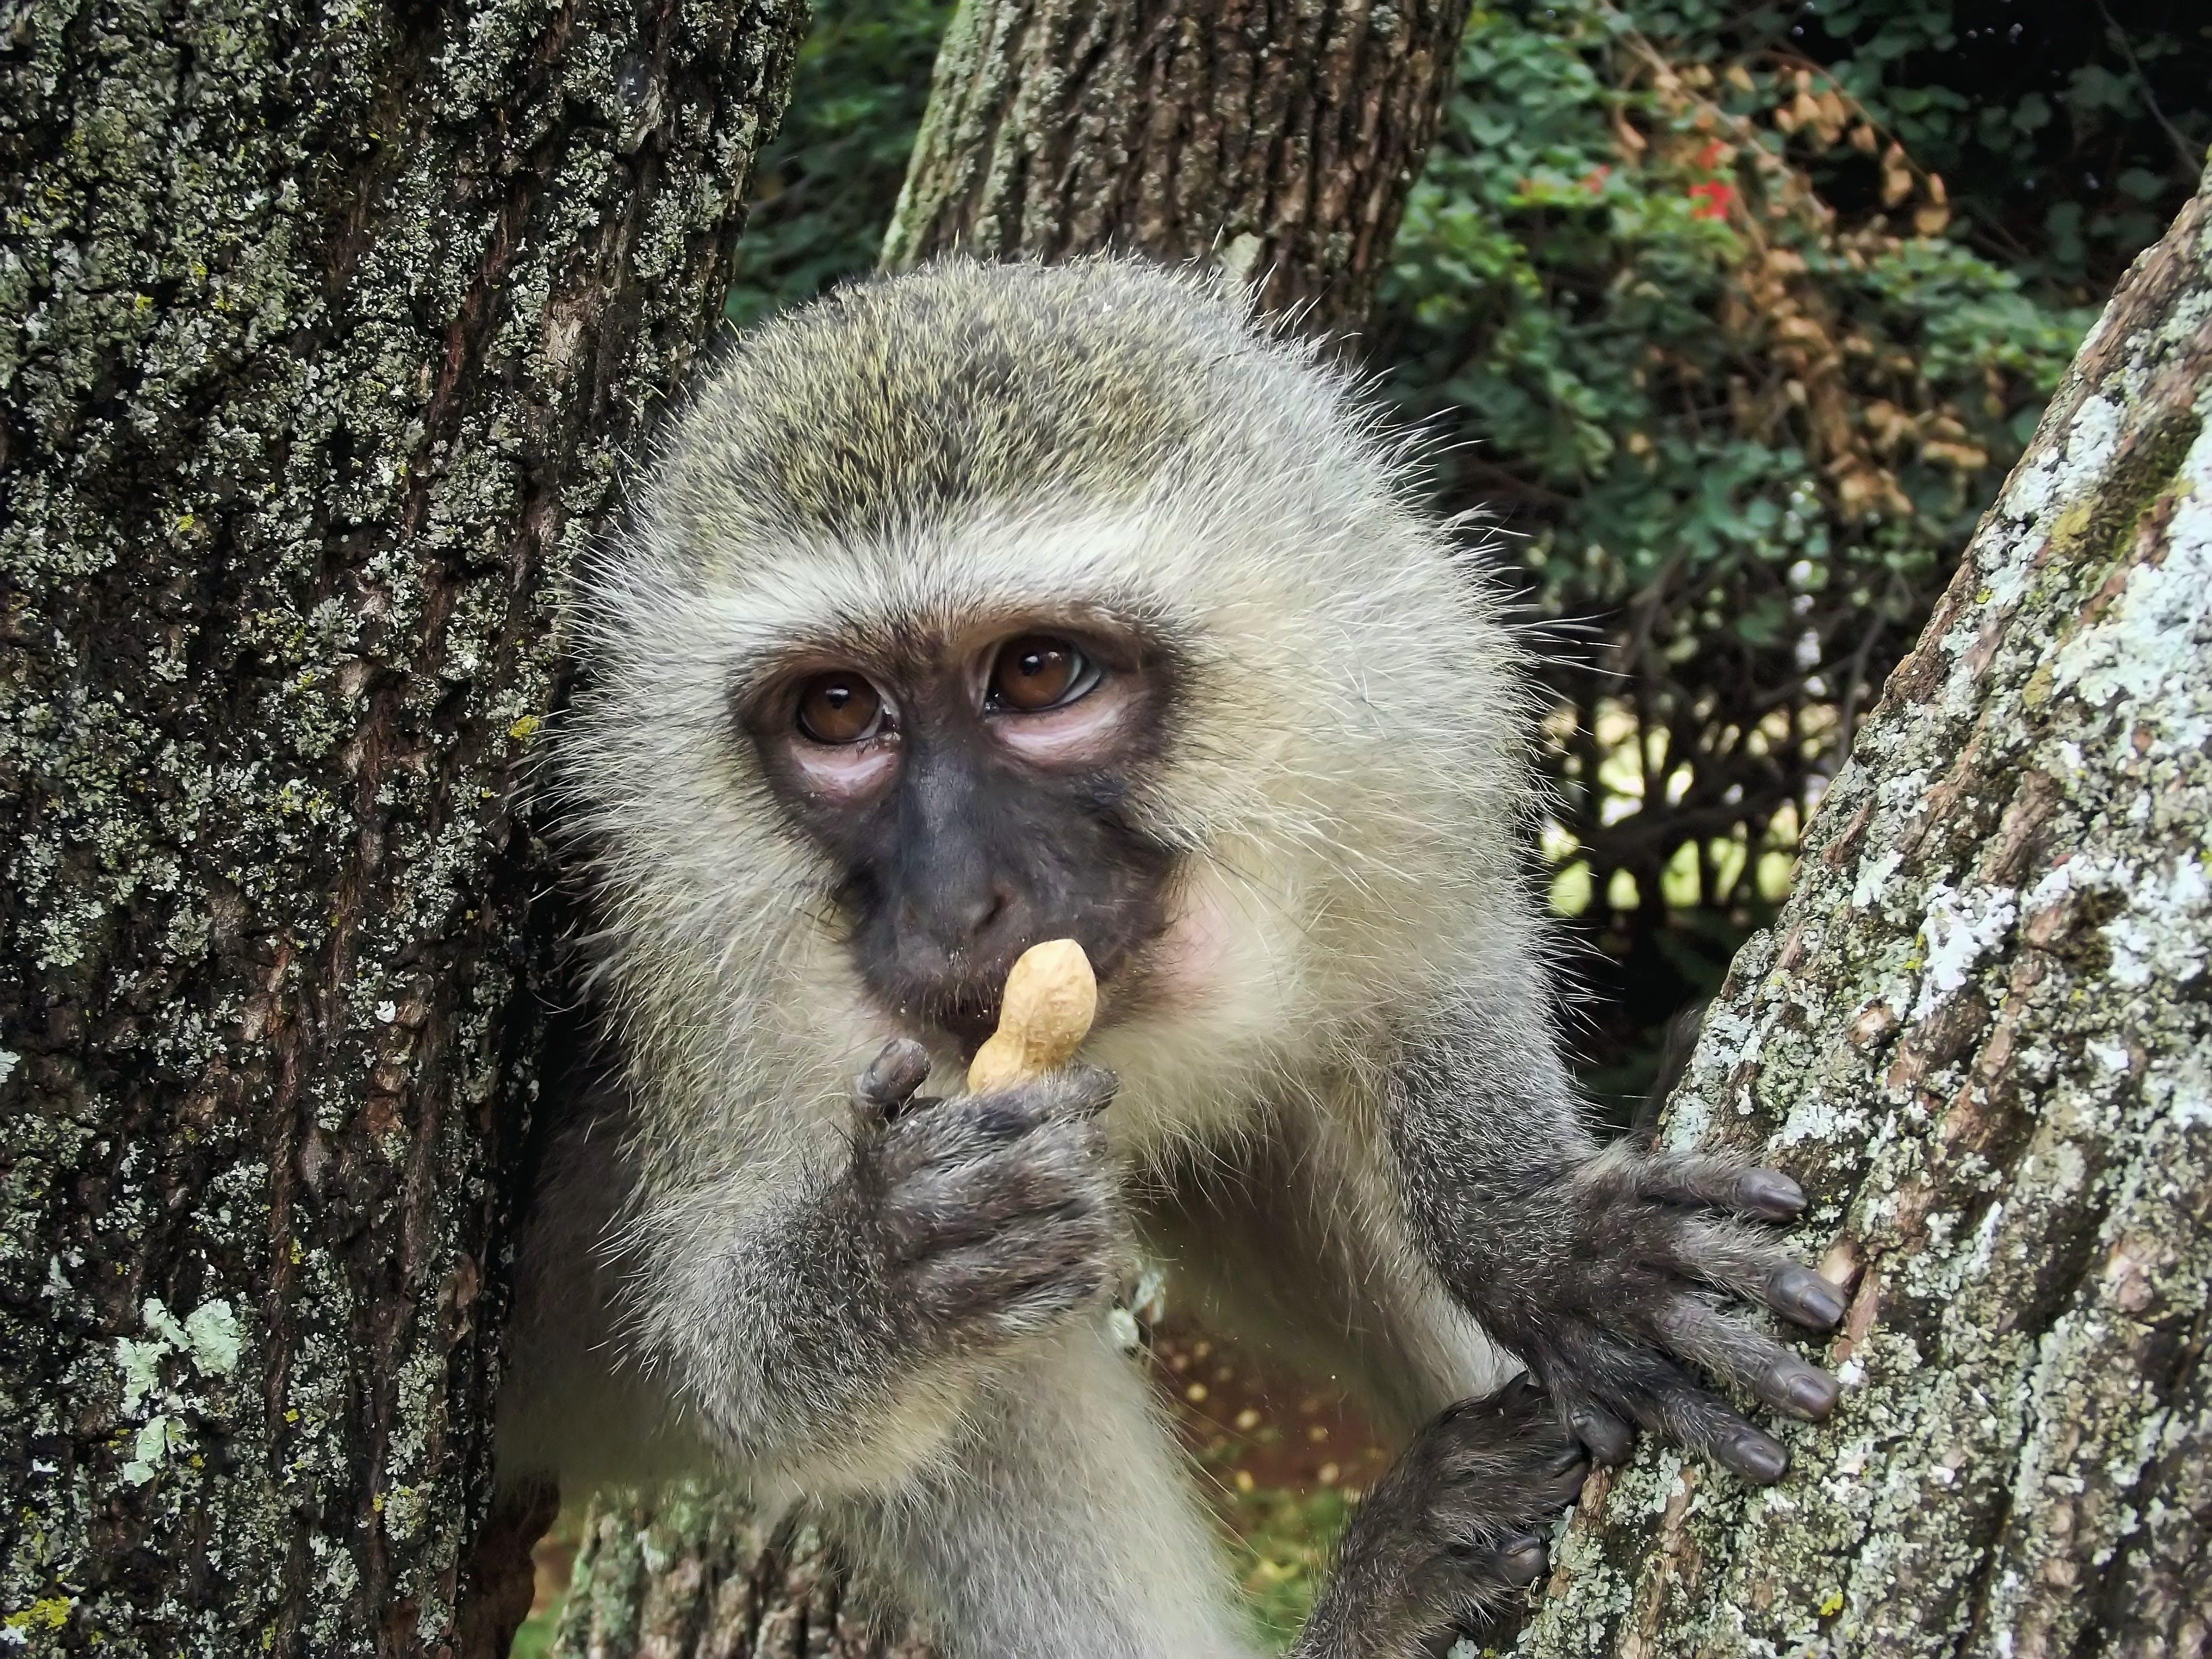 Gray and Black Monkey Holding Peanut